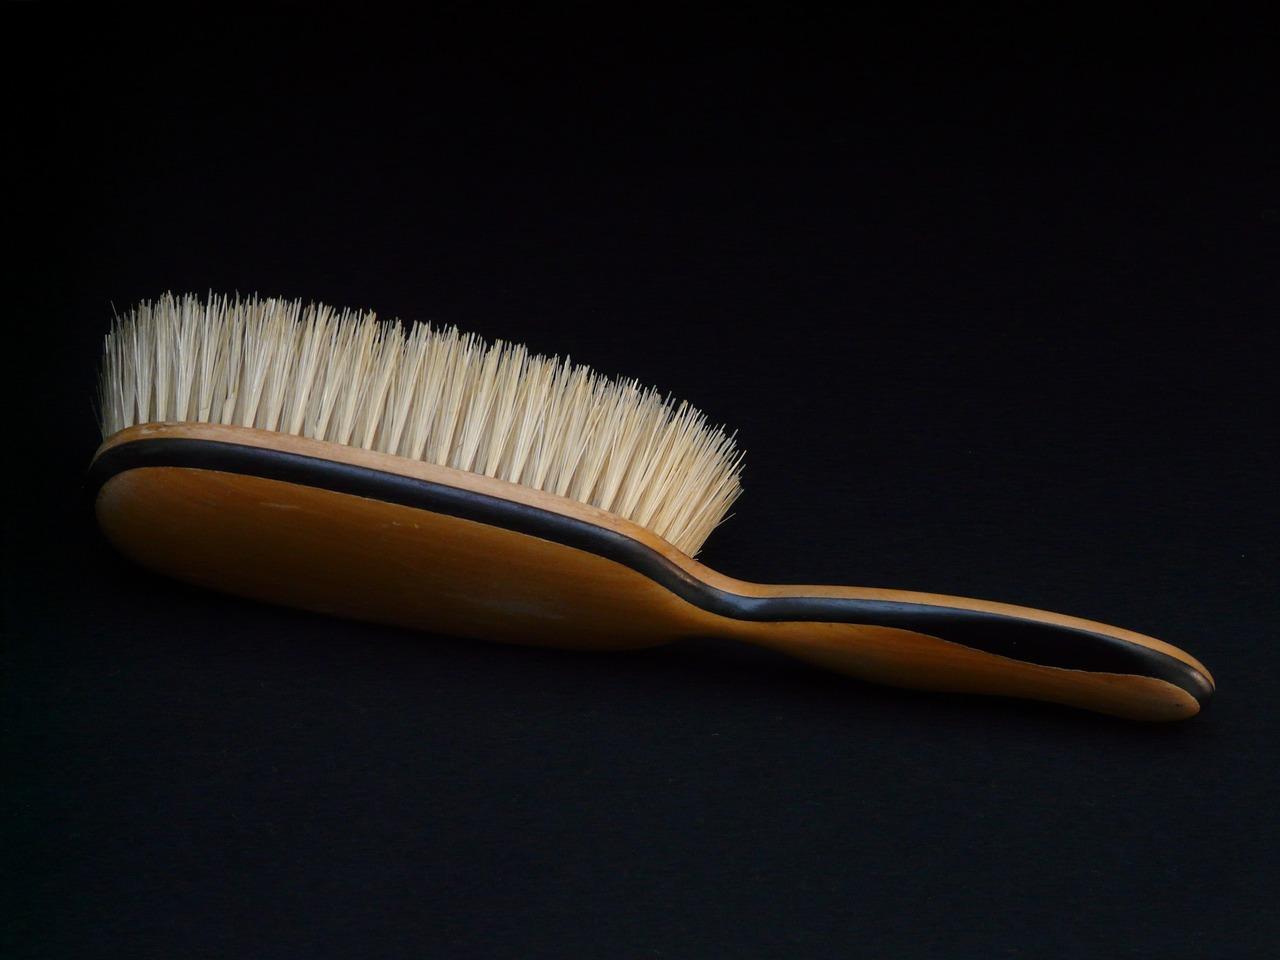 brush-tool-clean-eyelash-dresses-fashion-accessory-1152735-pxhere.com